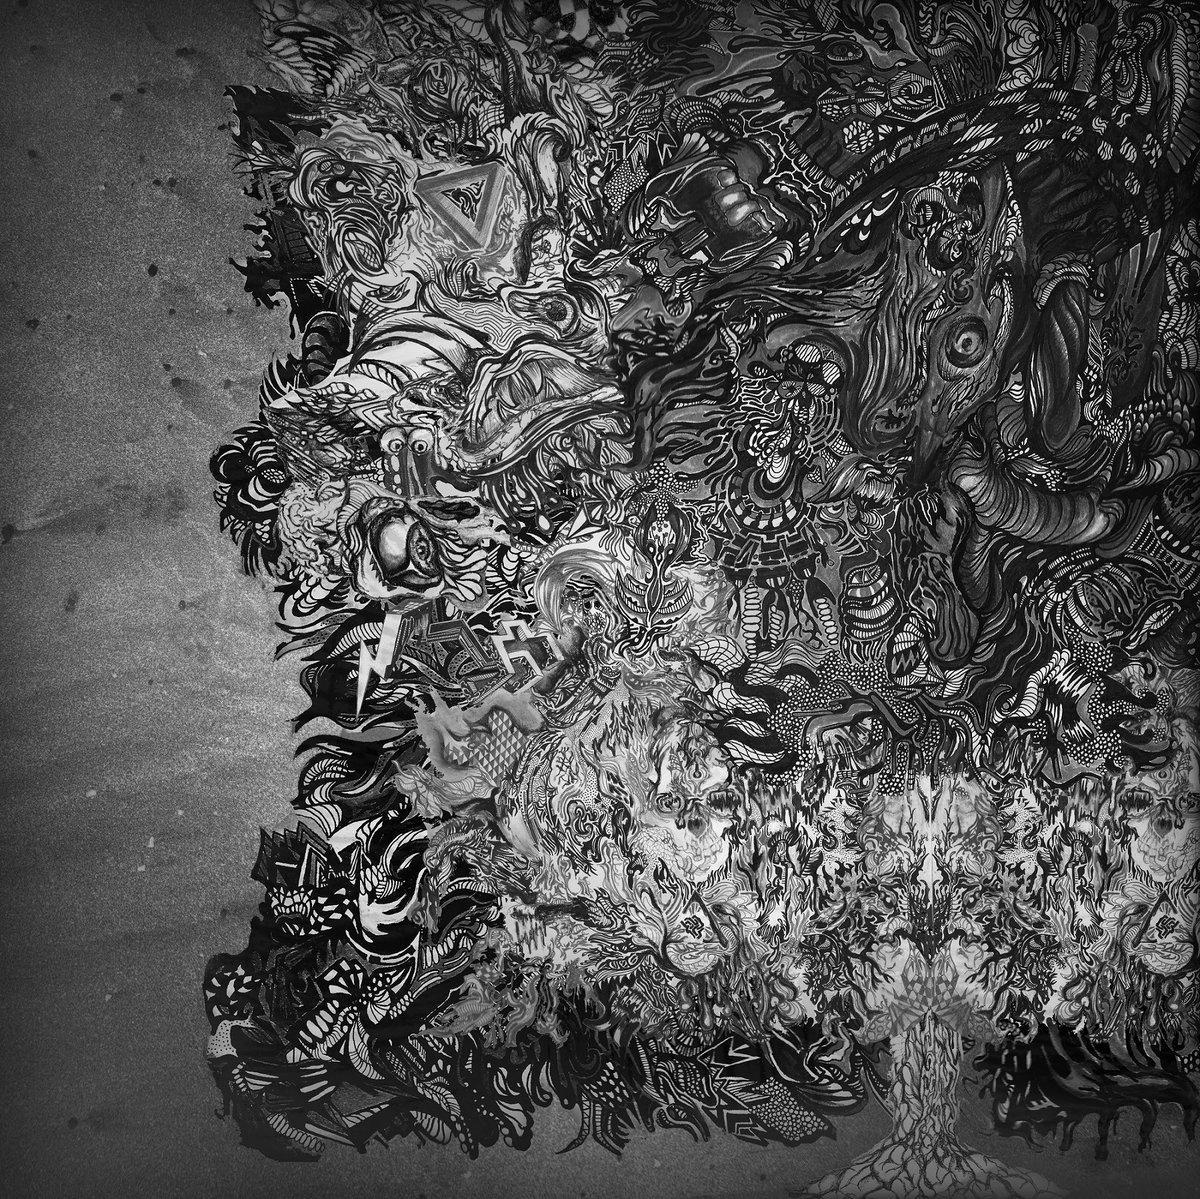 "AUTOCATALYTICA - Share Meshuggah Inspired Single ""Borndun"" Off Album ""Powerclashing Maximalism"" https://t.co/pyL0mEcAN1 #metal #meshuggah https://t.co/B7br8IFSHr"